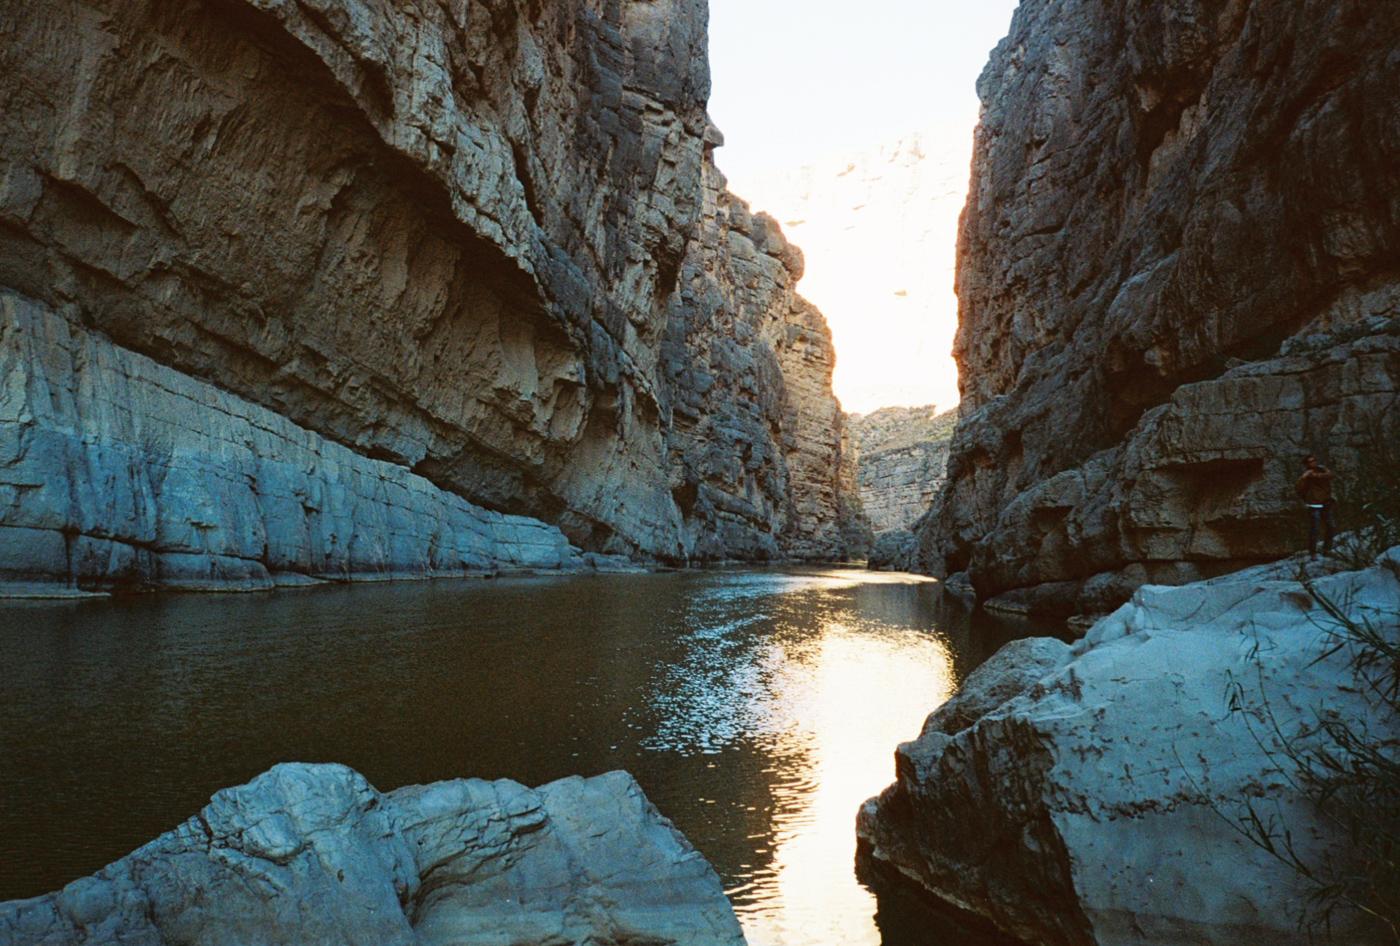 film 35mm lomo olympus hike camp big bend texas america yall pawlowski santa elena